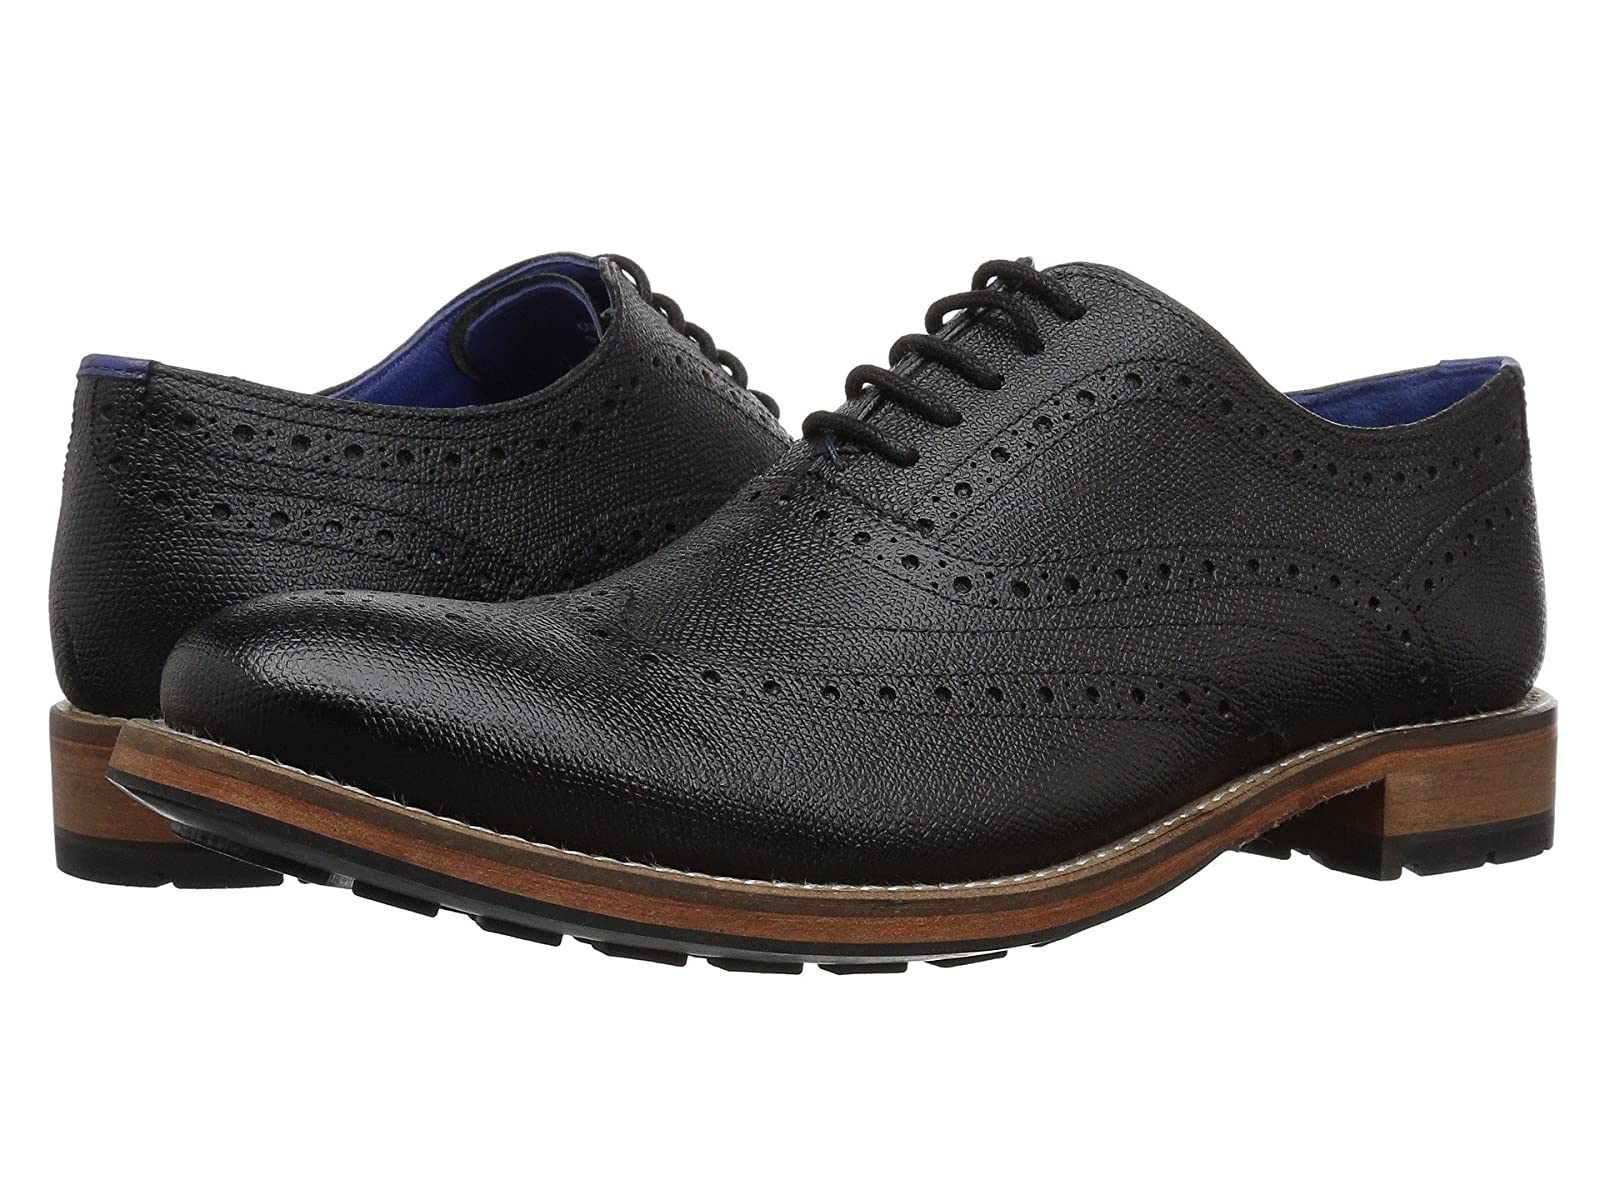 Ted Baker Guri 9Atmospheric grades have affordable shoes